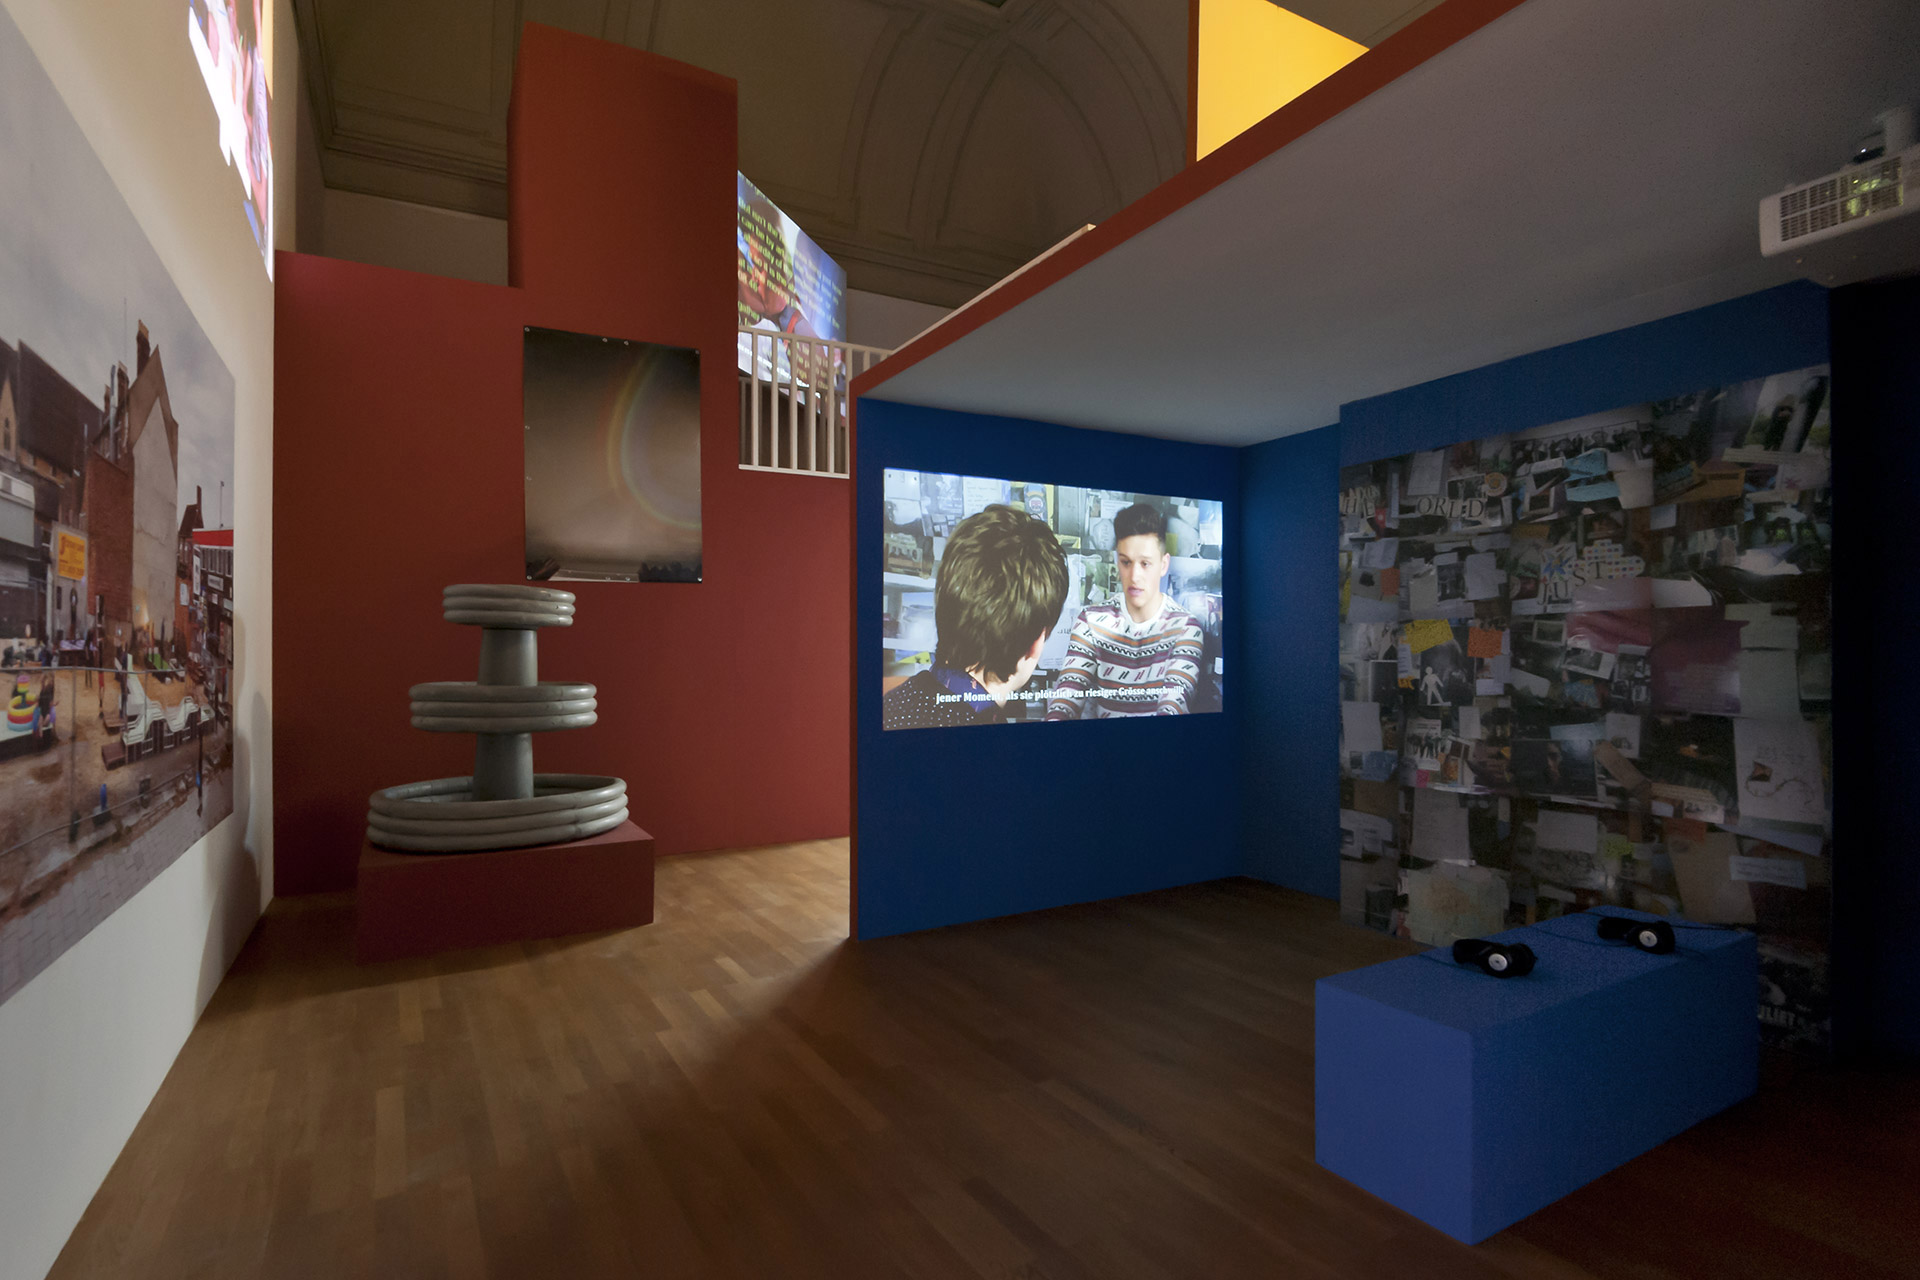 Andy-Holden-Kunsthalle-Winterthur-2015-2.jpg